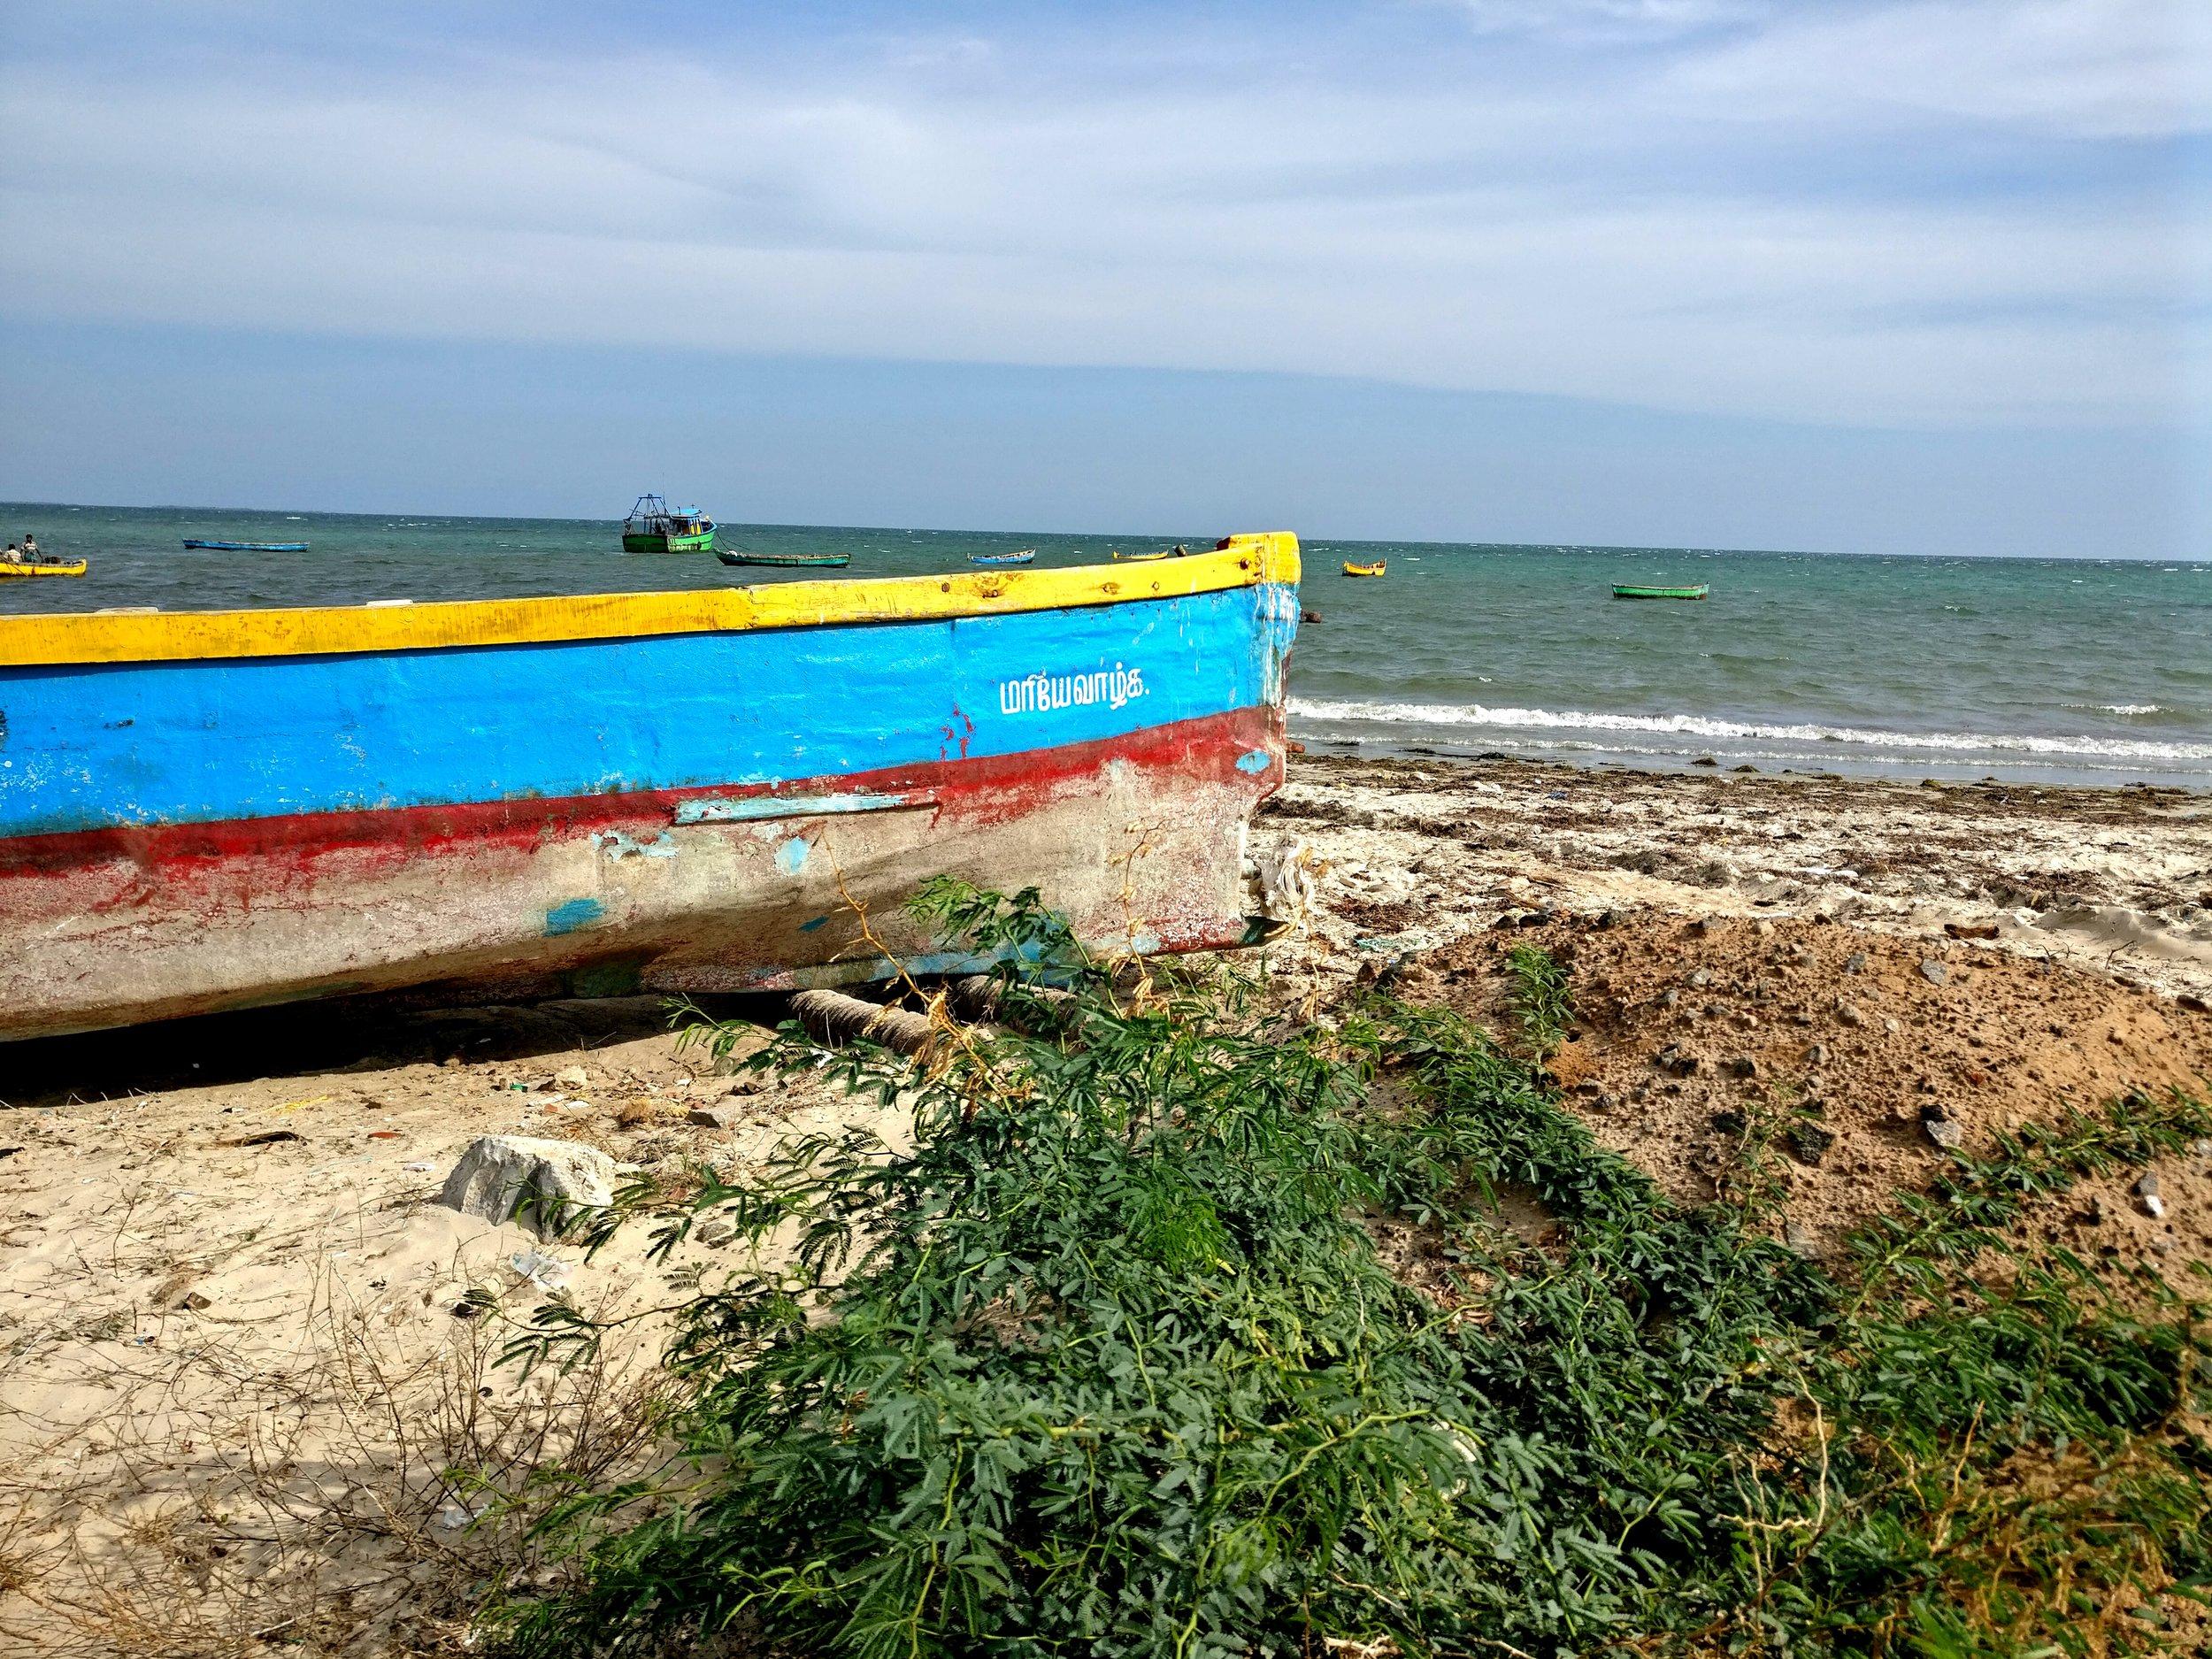 Kilakkarai Harbor (2017). Photo by Kalyani Ramnath.